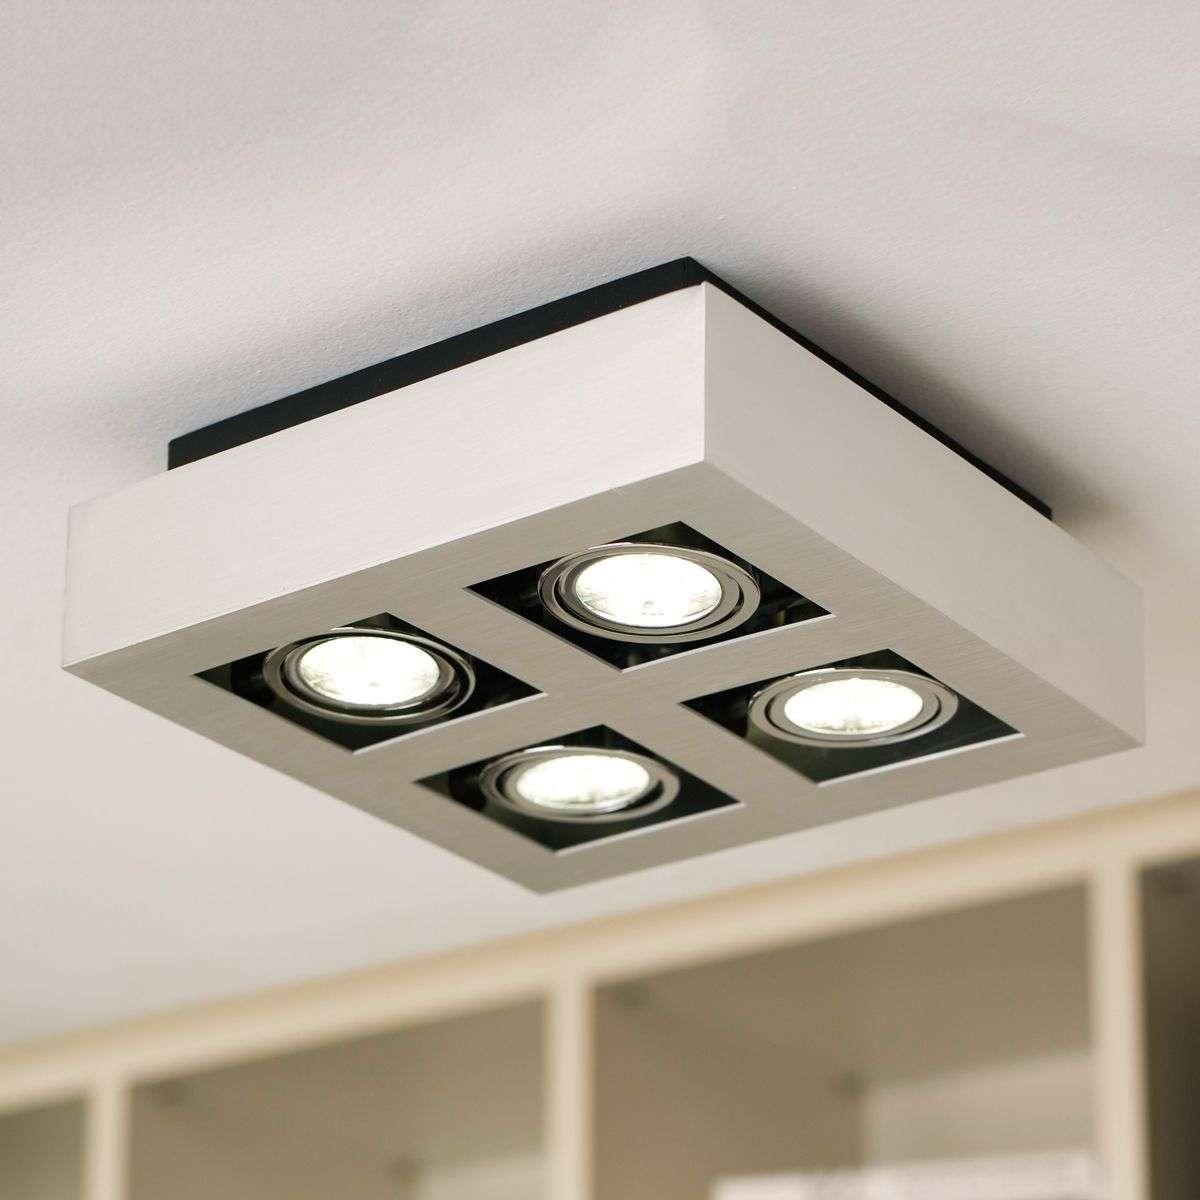 Loke four lamp led ceiling lamp